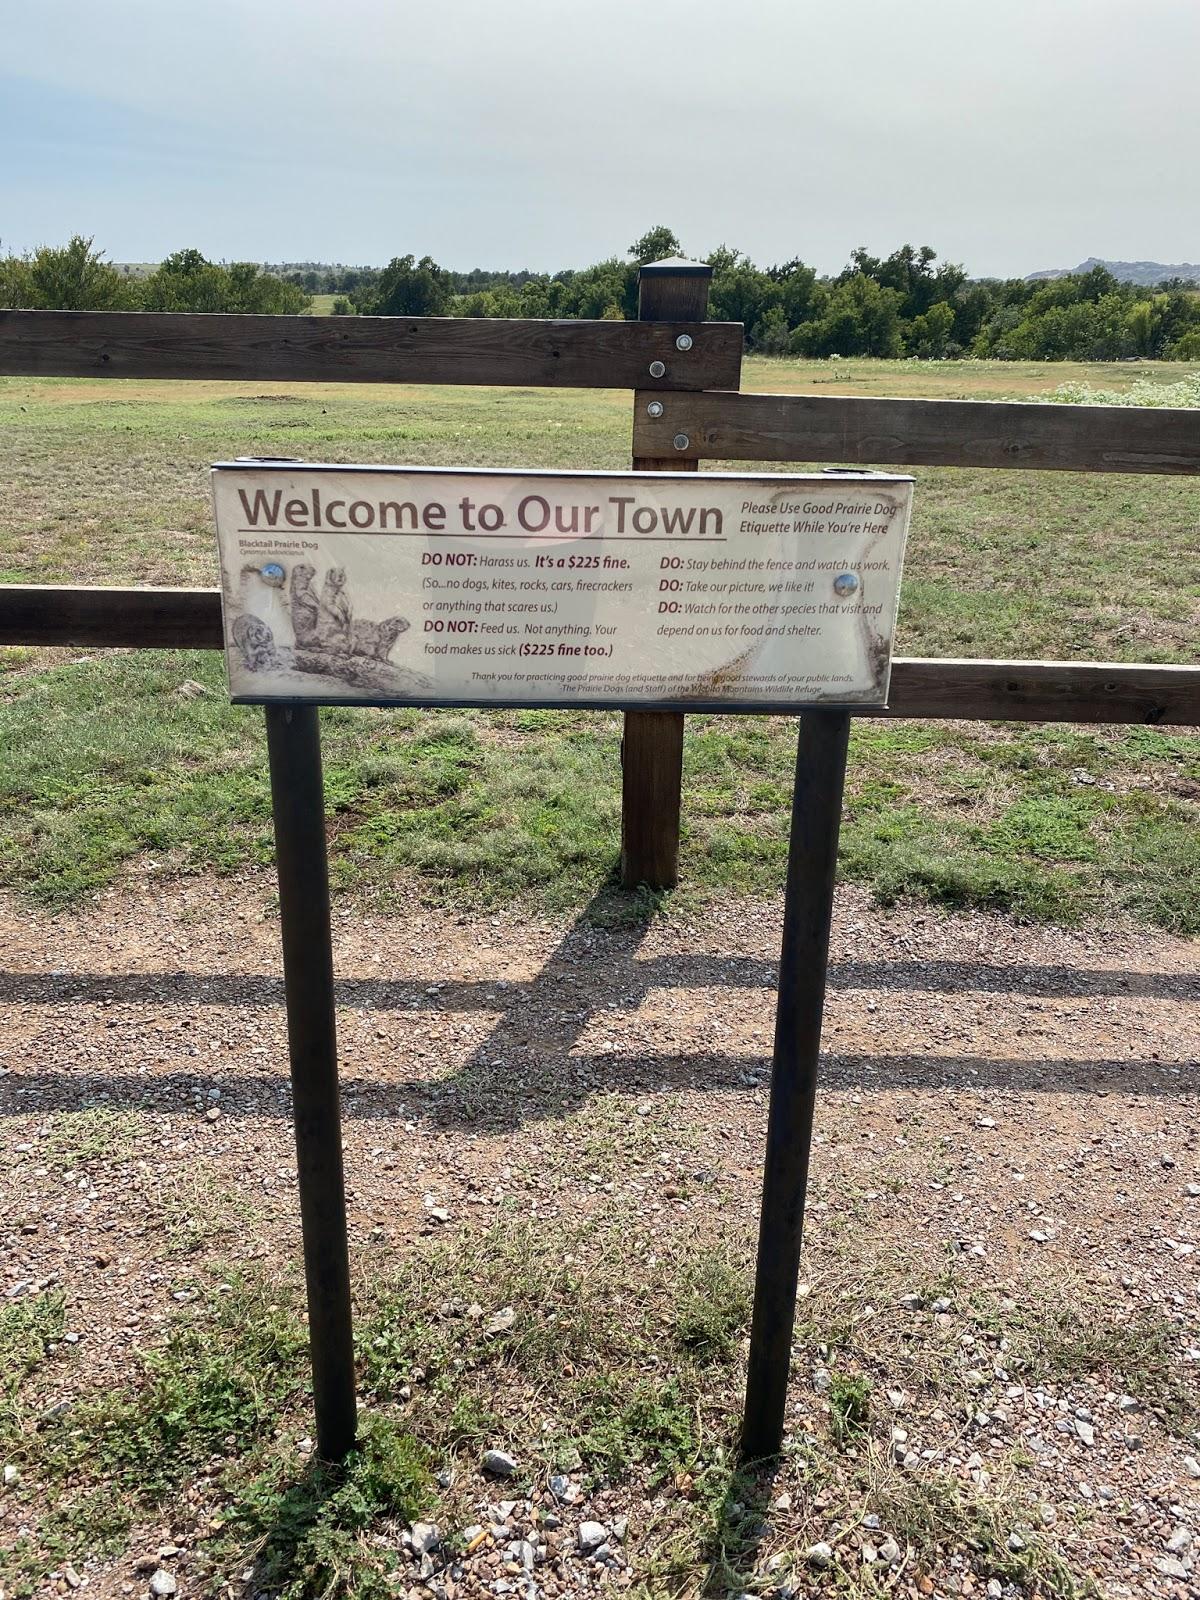 Visiting the Wichita Mountains Wildlife Refuge